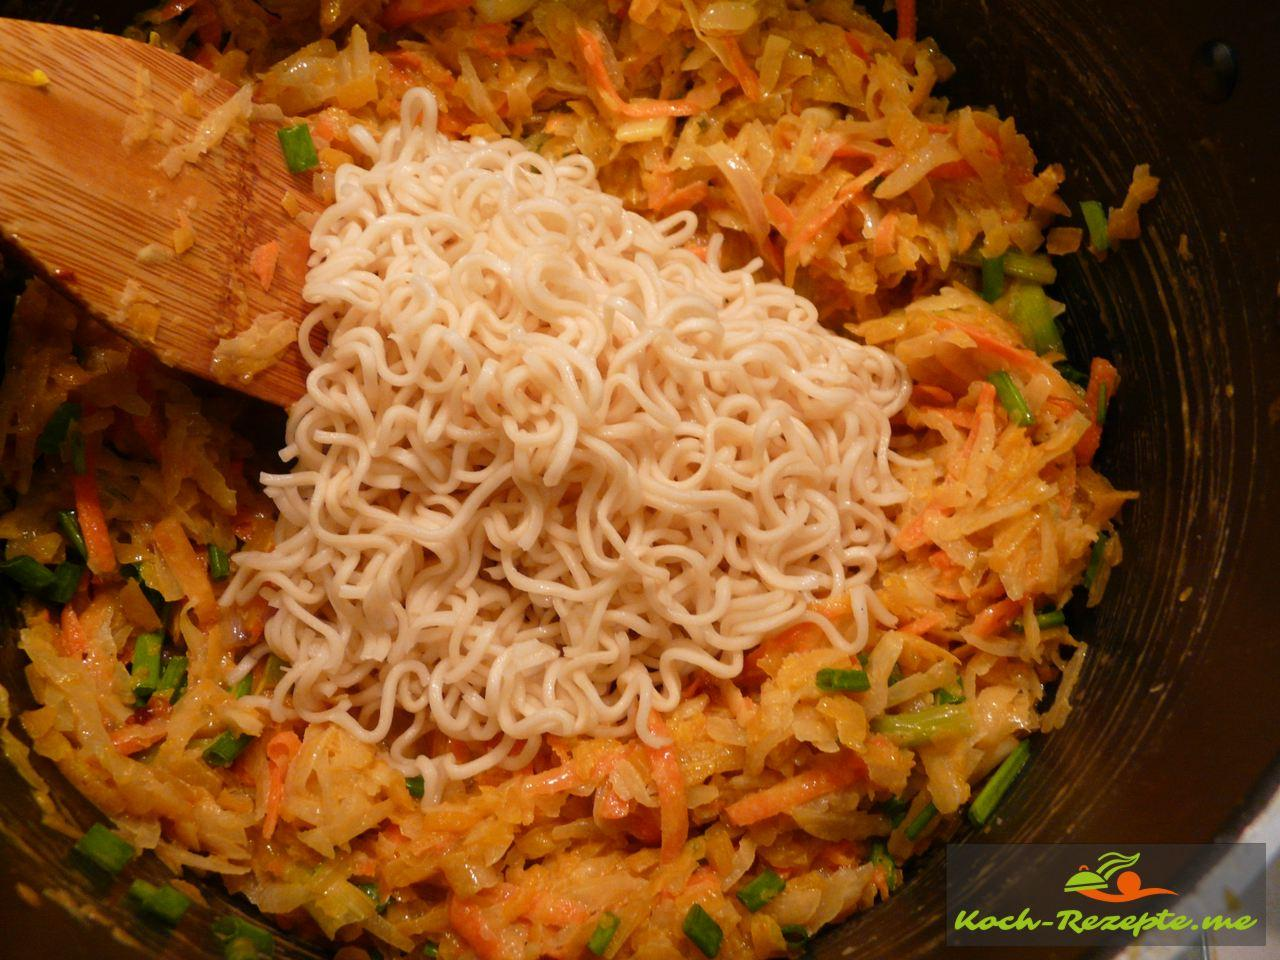 Thai Rezept Gemüse Nudeln Garnelen. Nudeln unters Gemüse heben